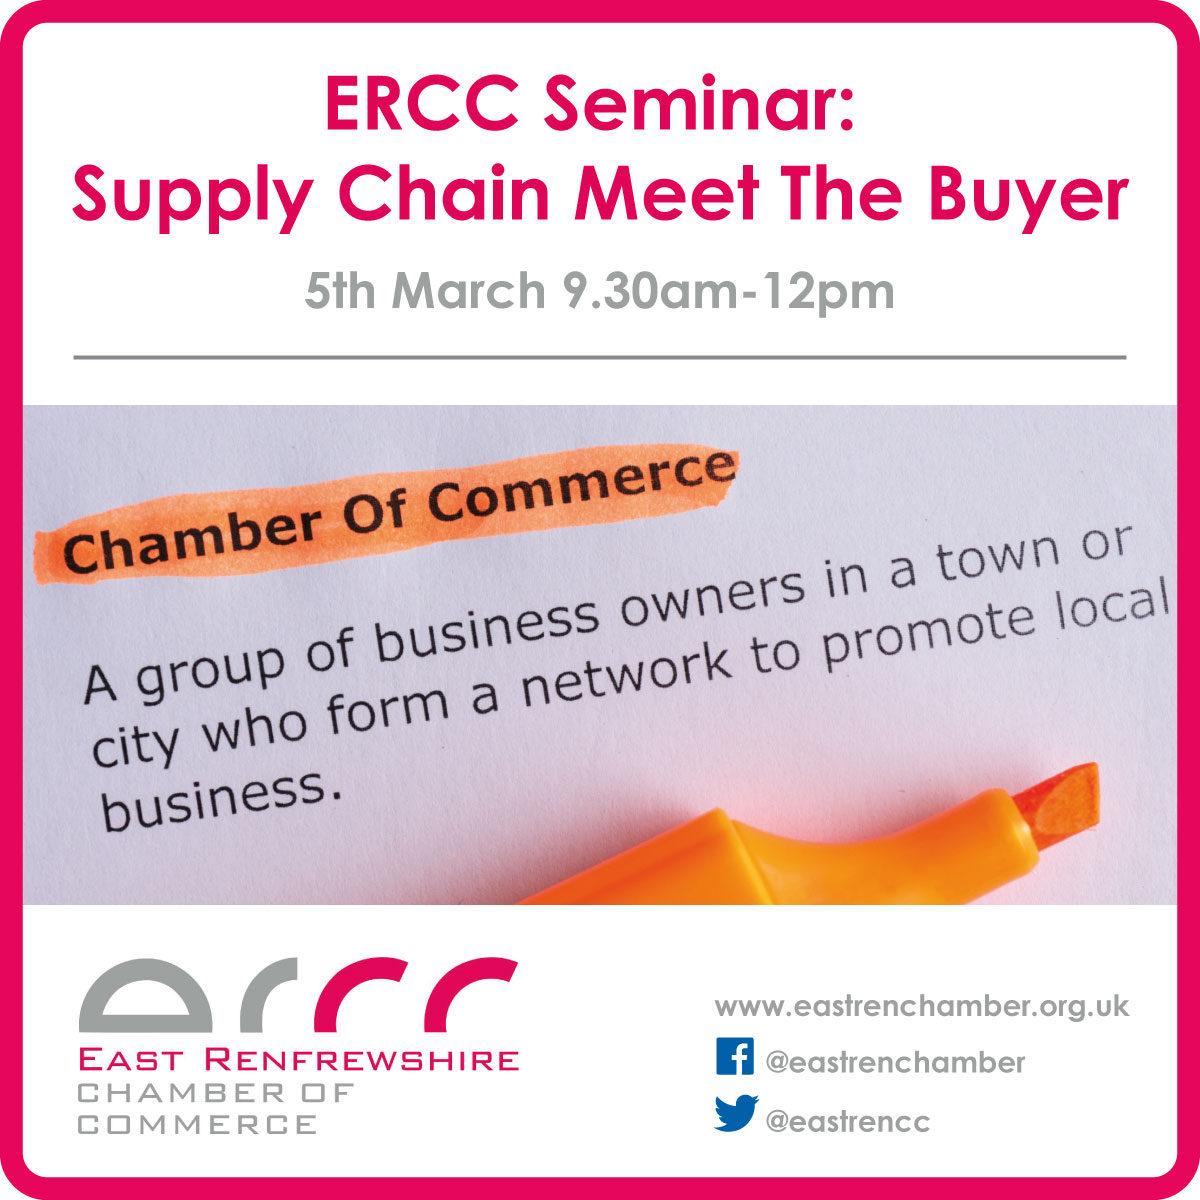 Supply Chain Meet the Buyer